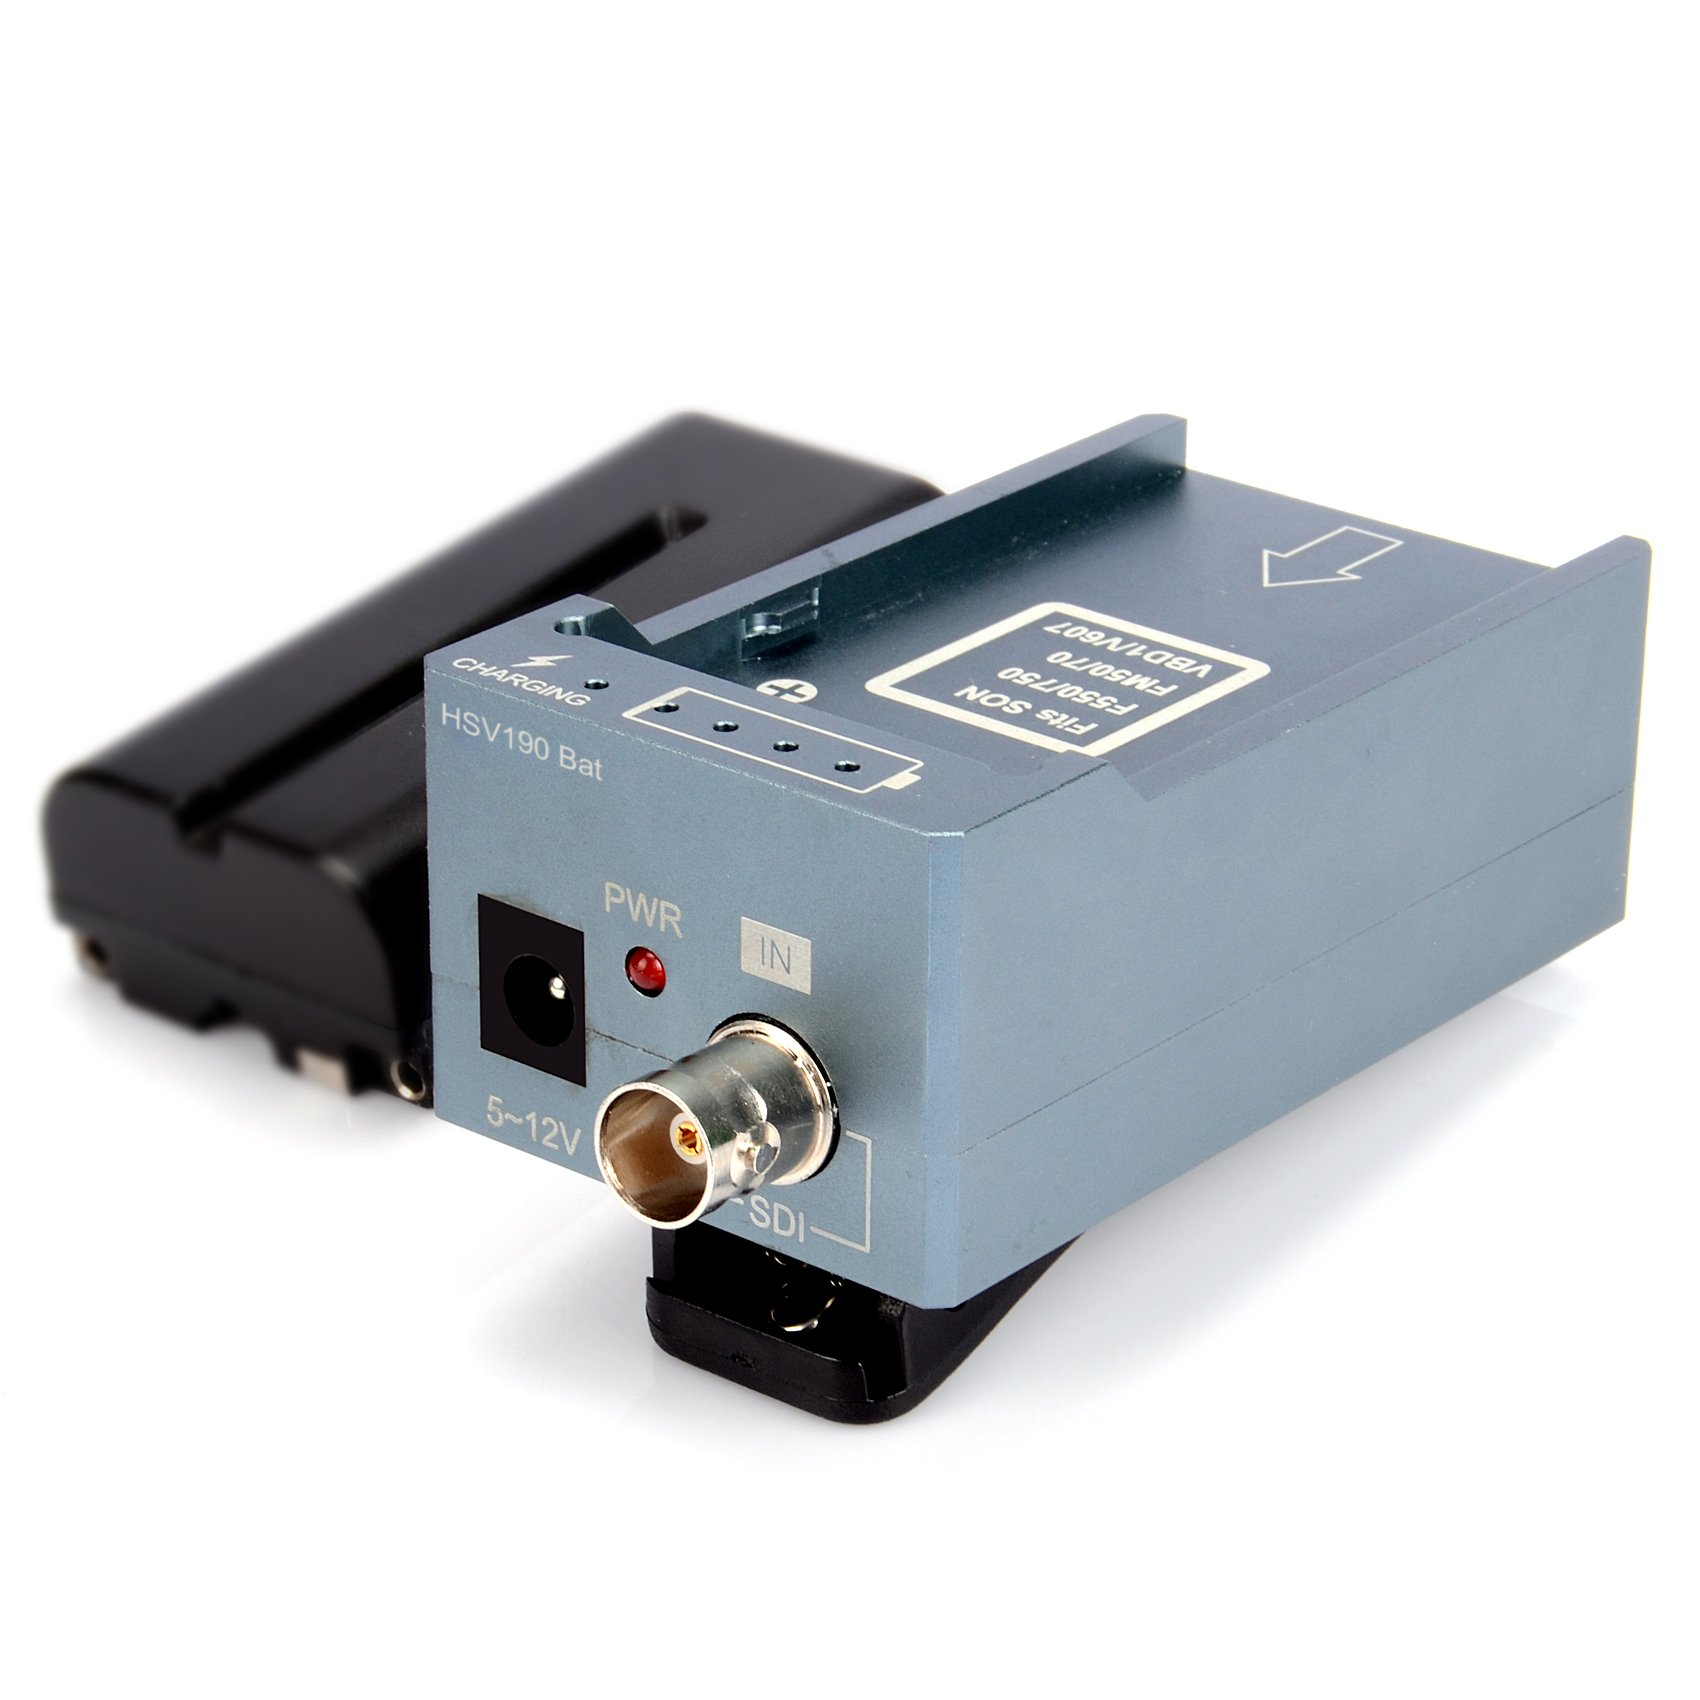 Mirabox Design Battery Converter SDI to HDMI Adapter Convert SD/HD-SDI/3G-SDI Multimedia HD Video Converter Portable Mini Size With Clips(HSV190Bat)